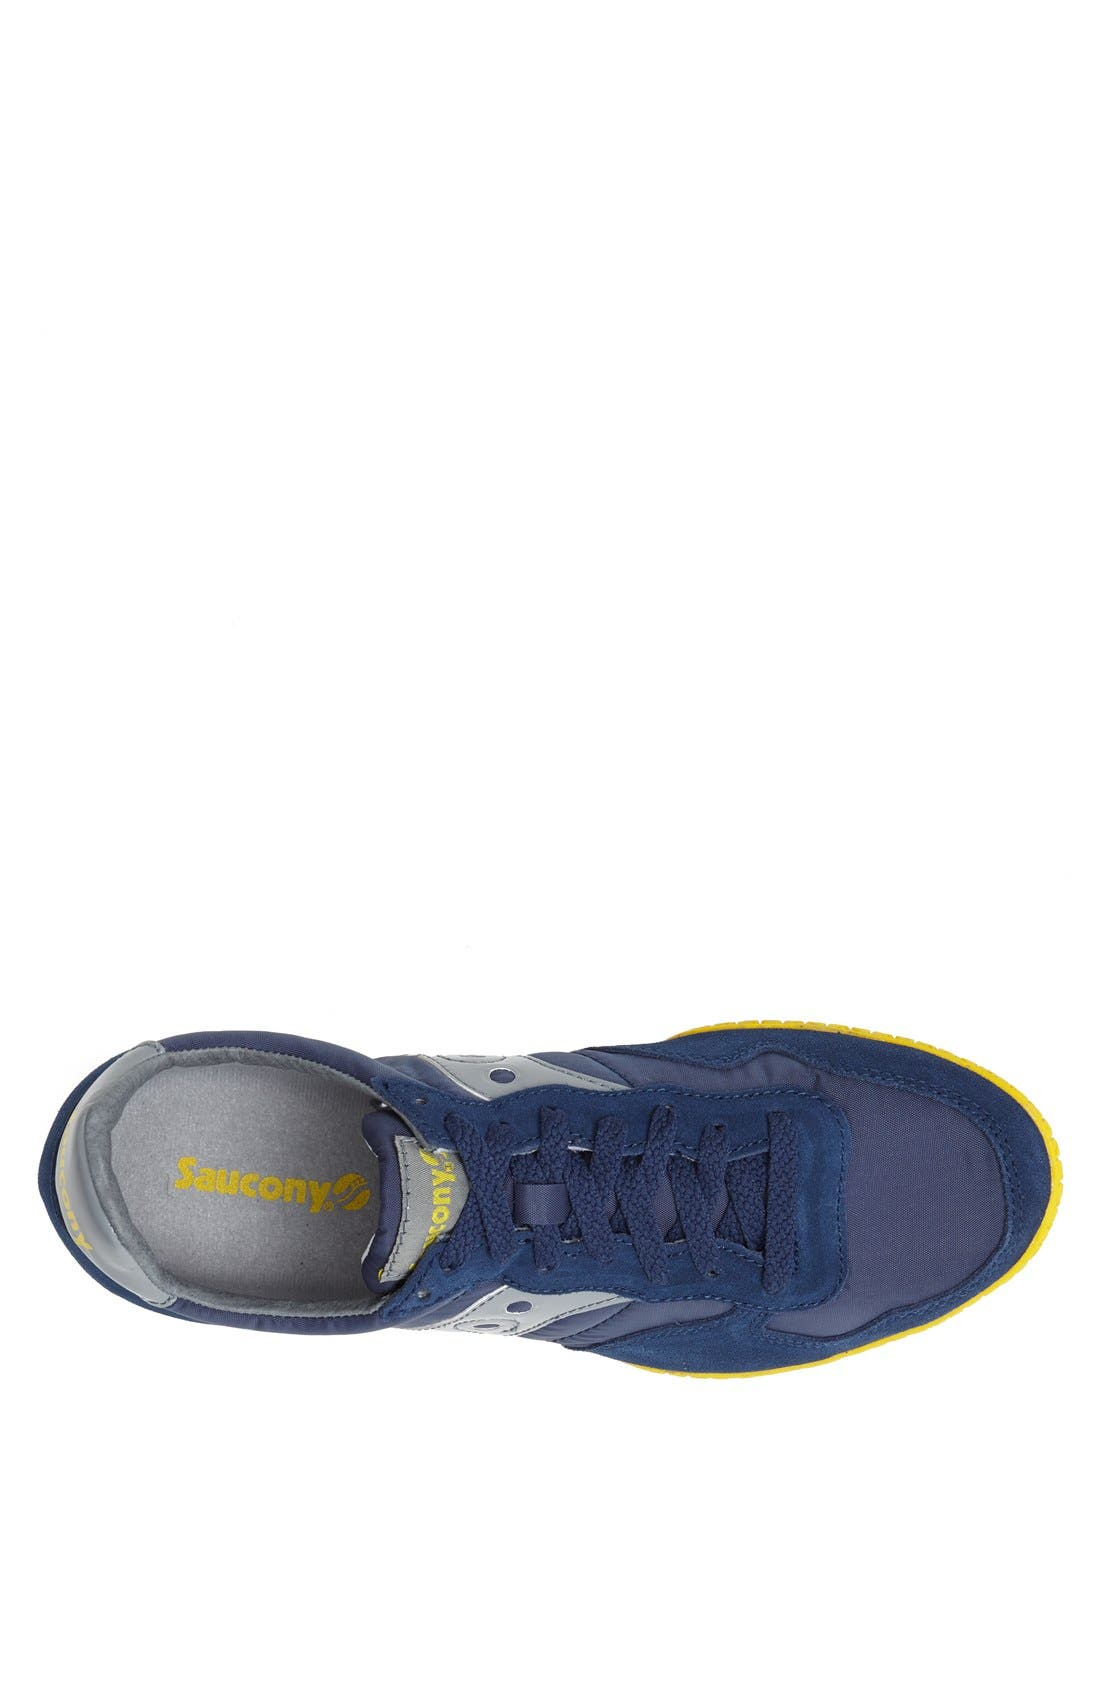 Alternate Image 3  - Saucony 'Bullet' Sneaker (Men)